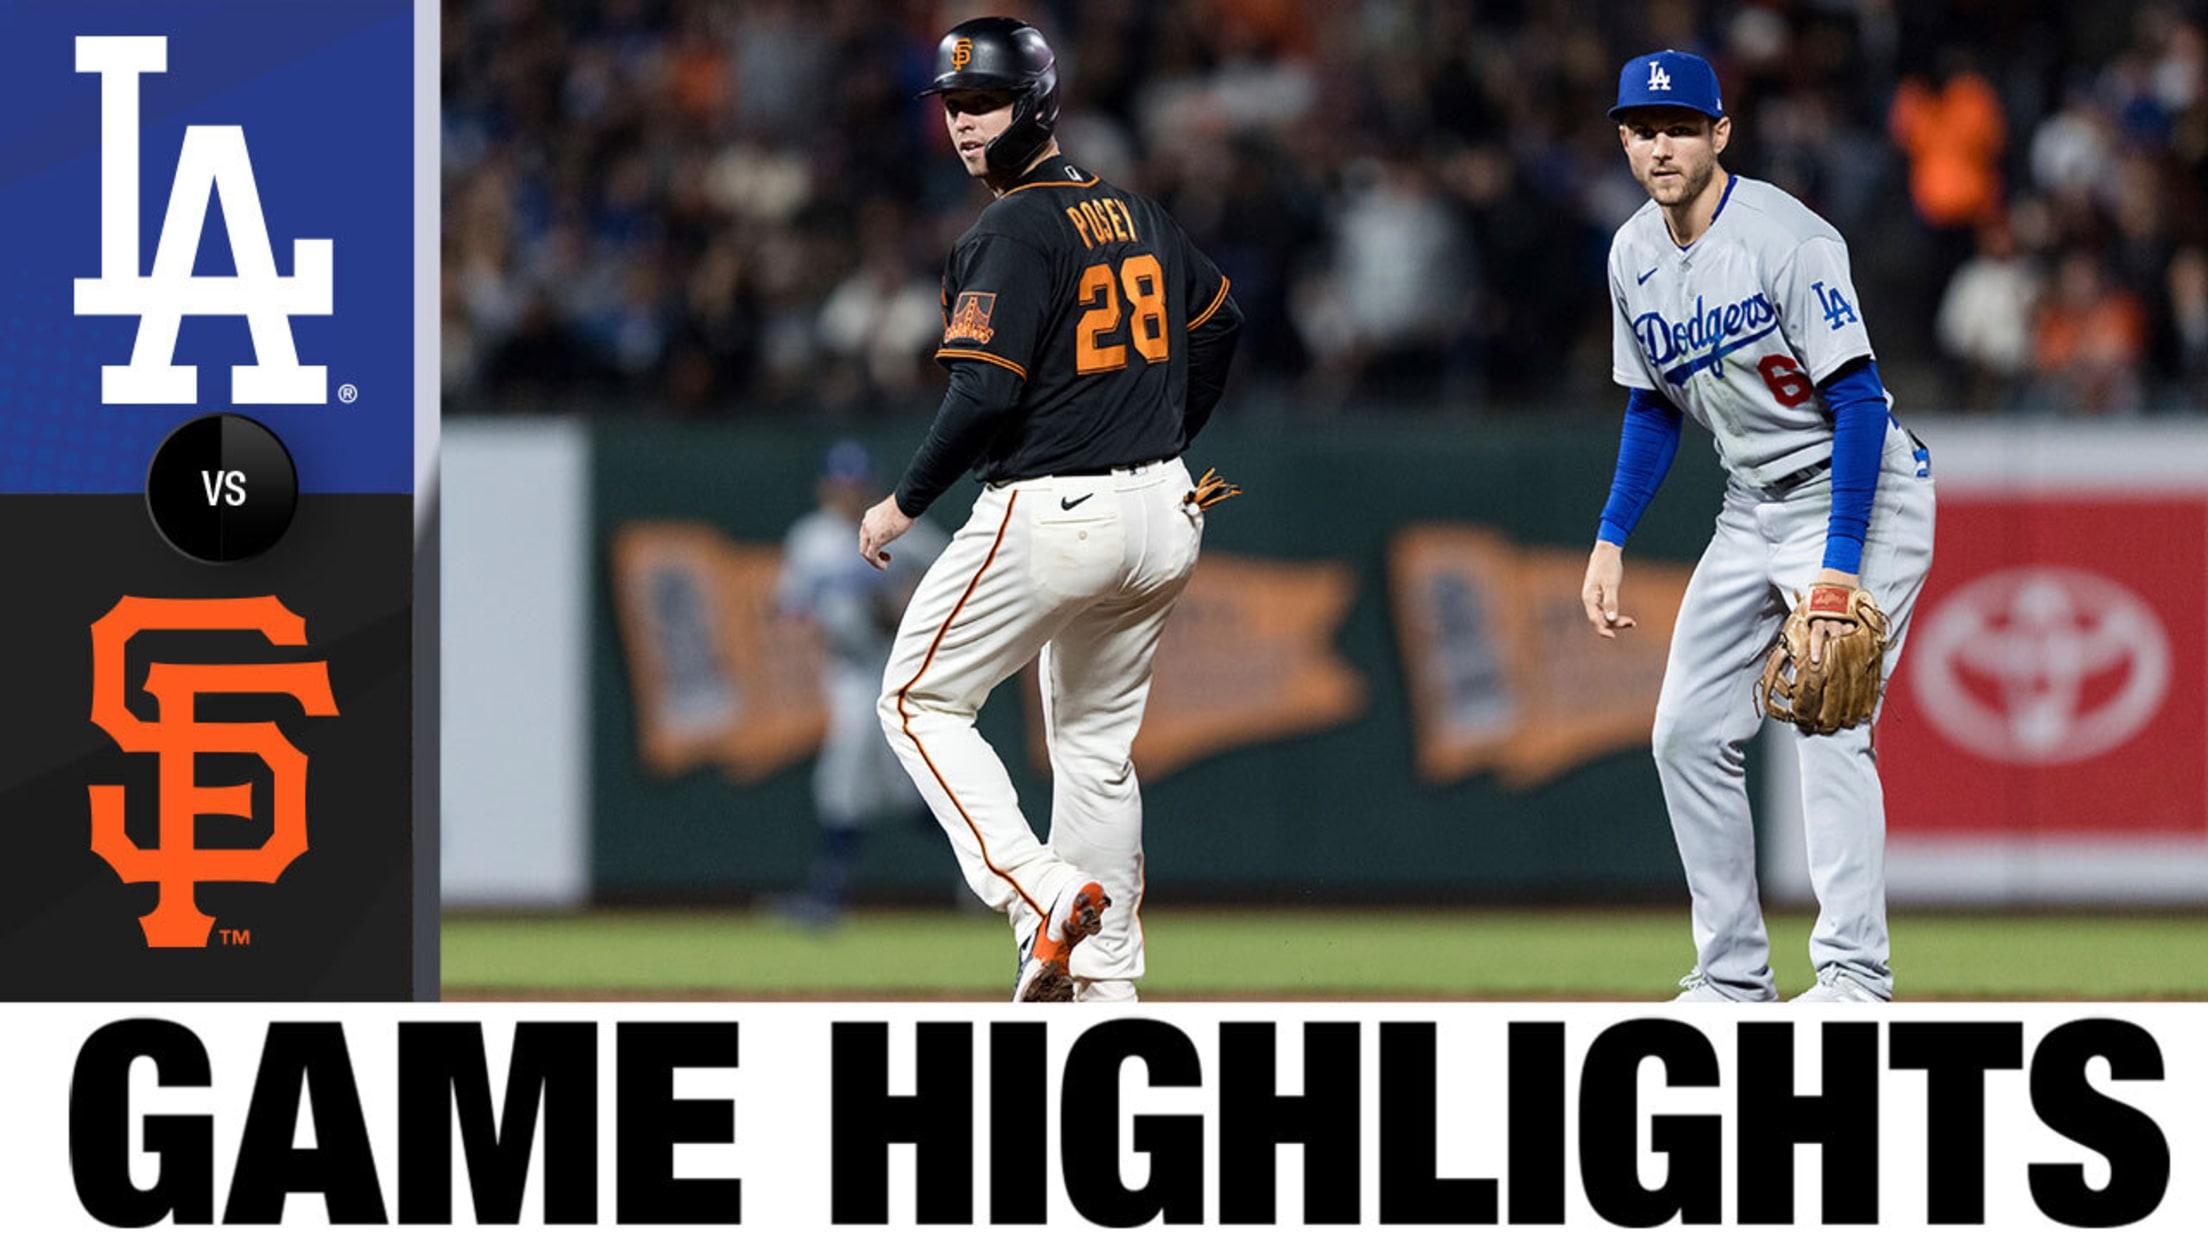 dodger game yesterday recap Dodgers Game Recap Videos  Los Angeles Dodgers